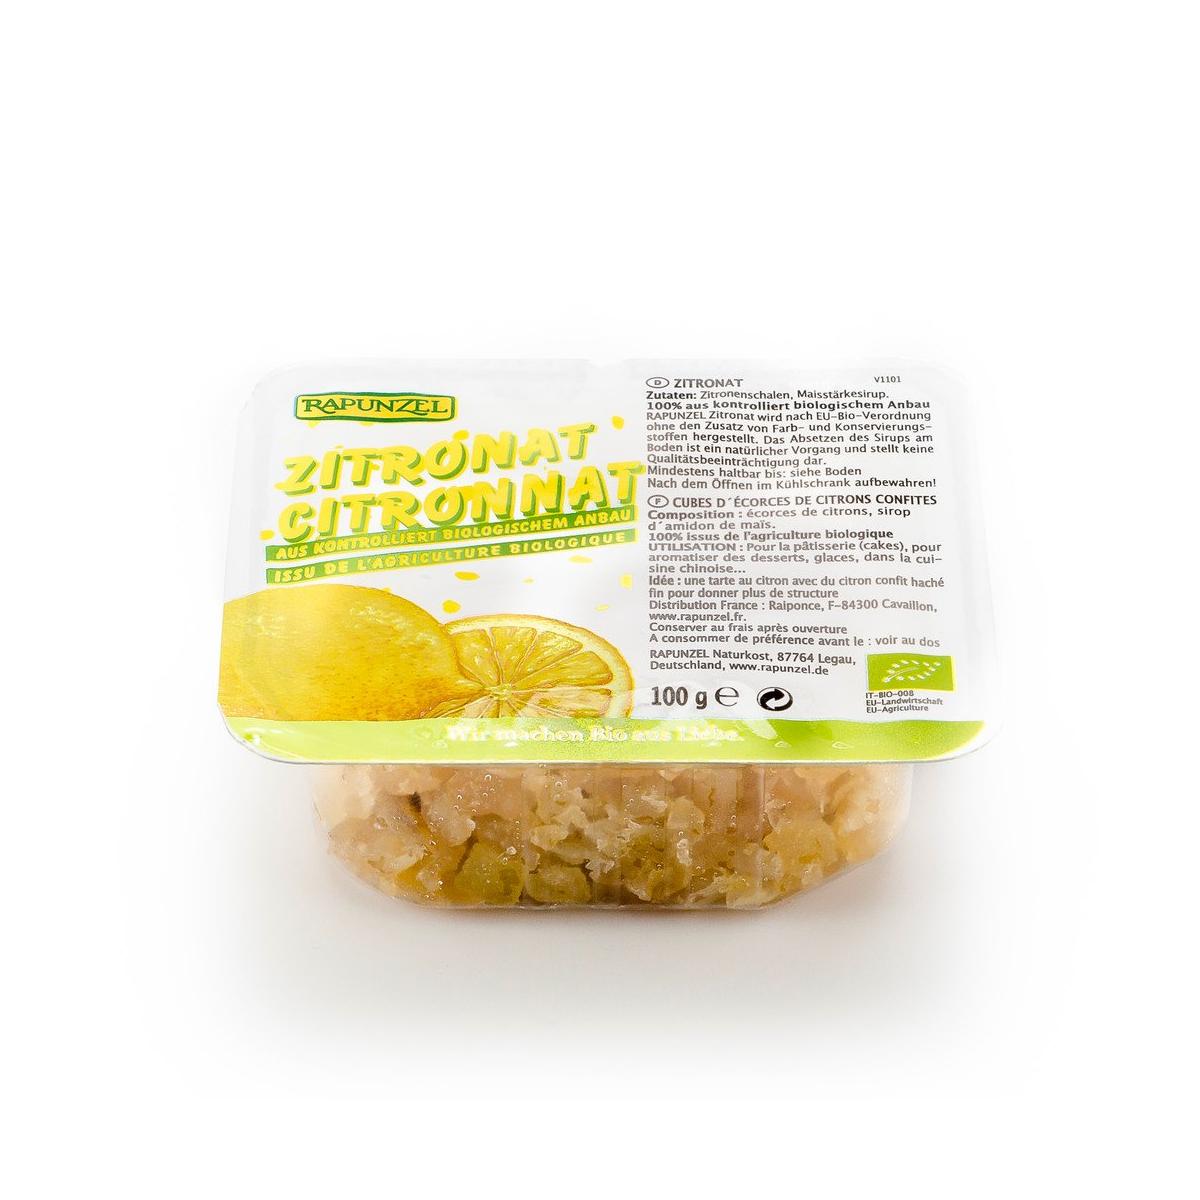 Zitronat ohne Weisszucker